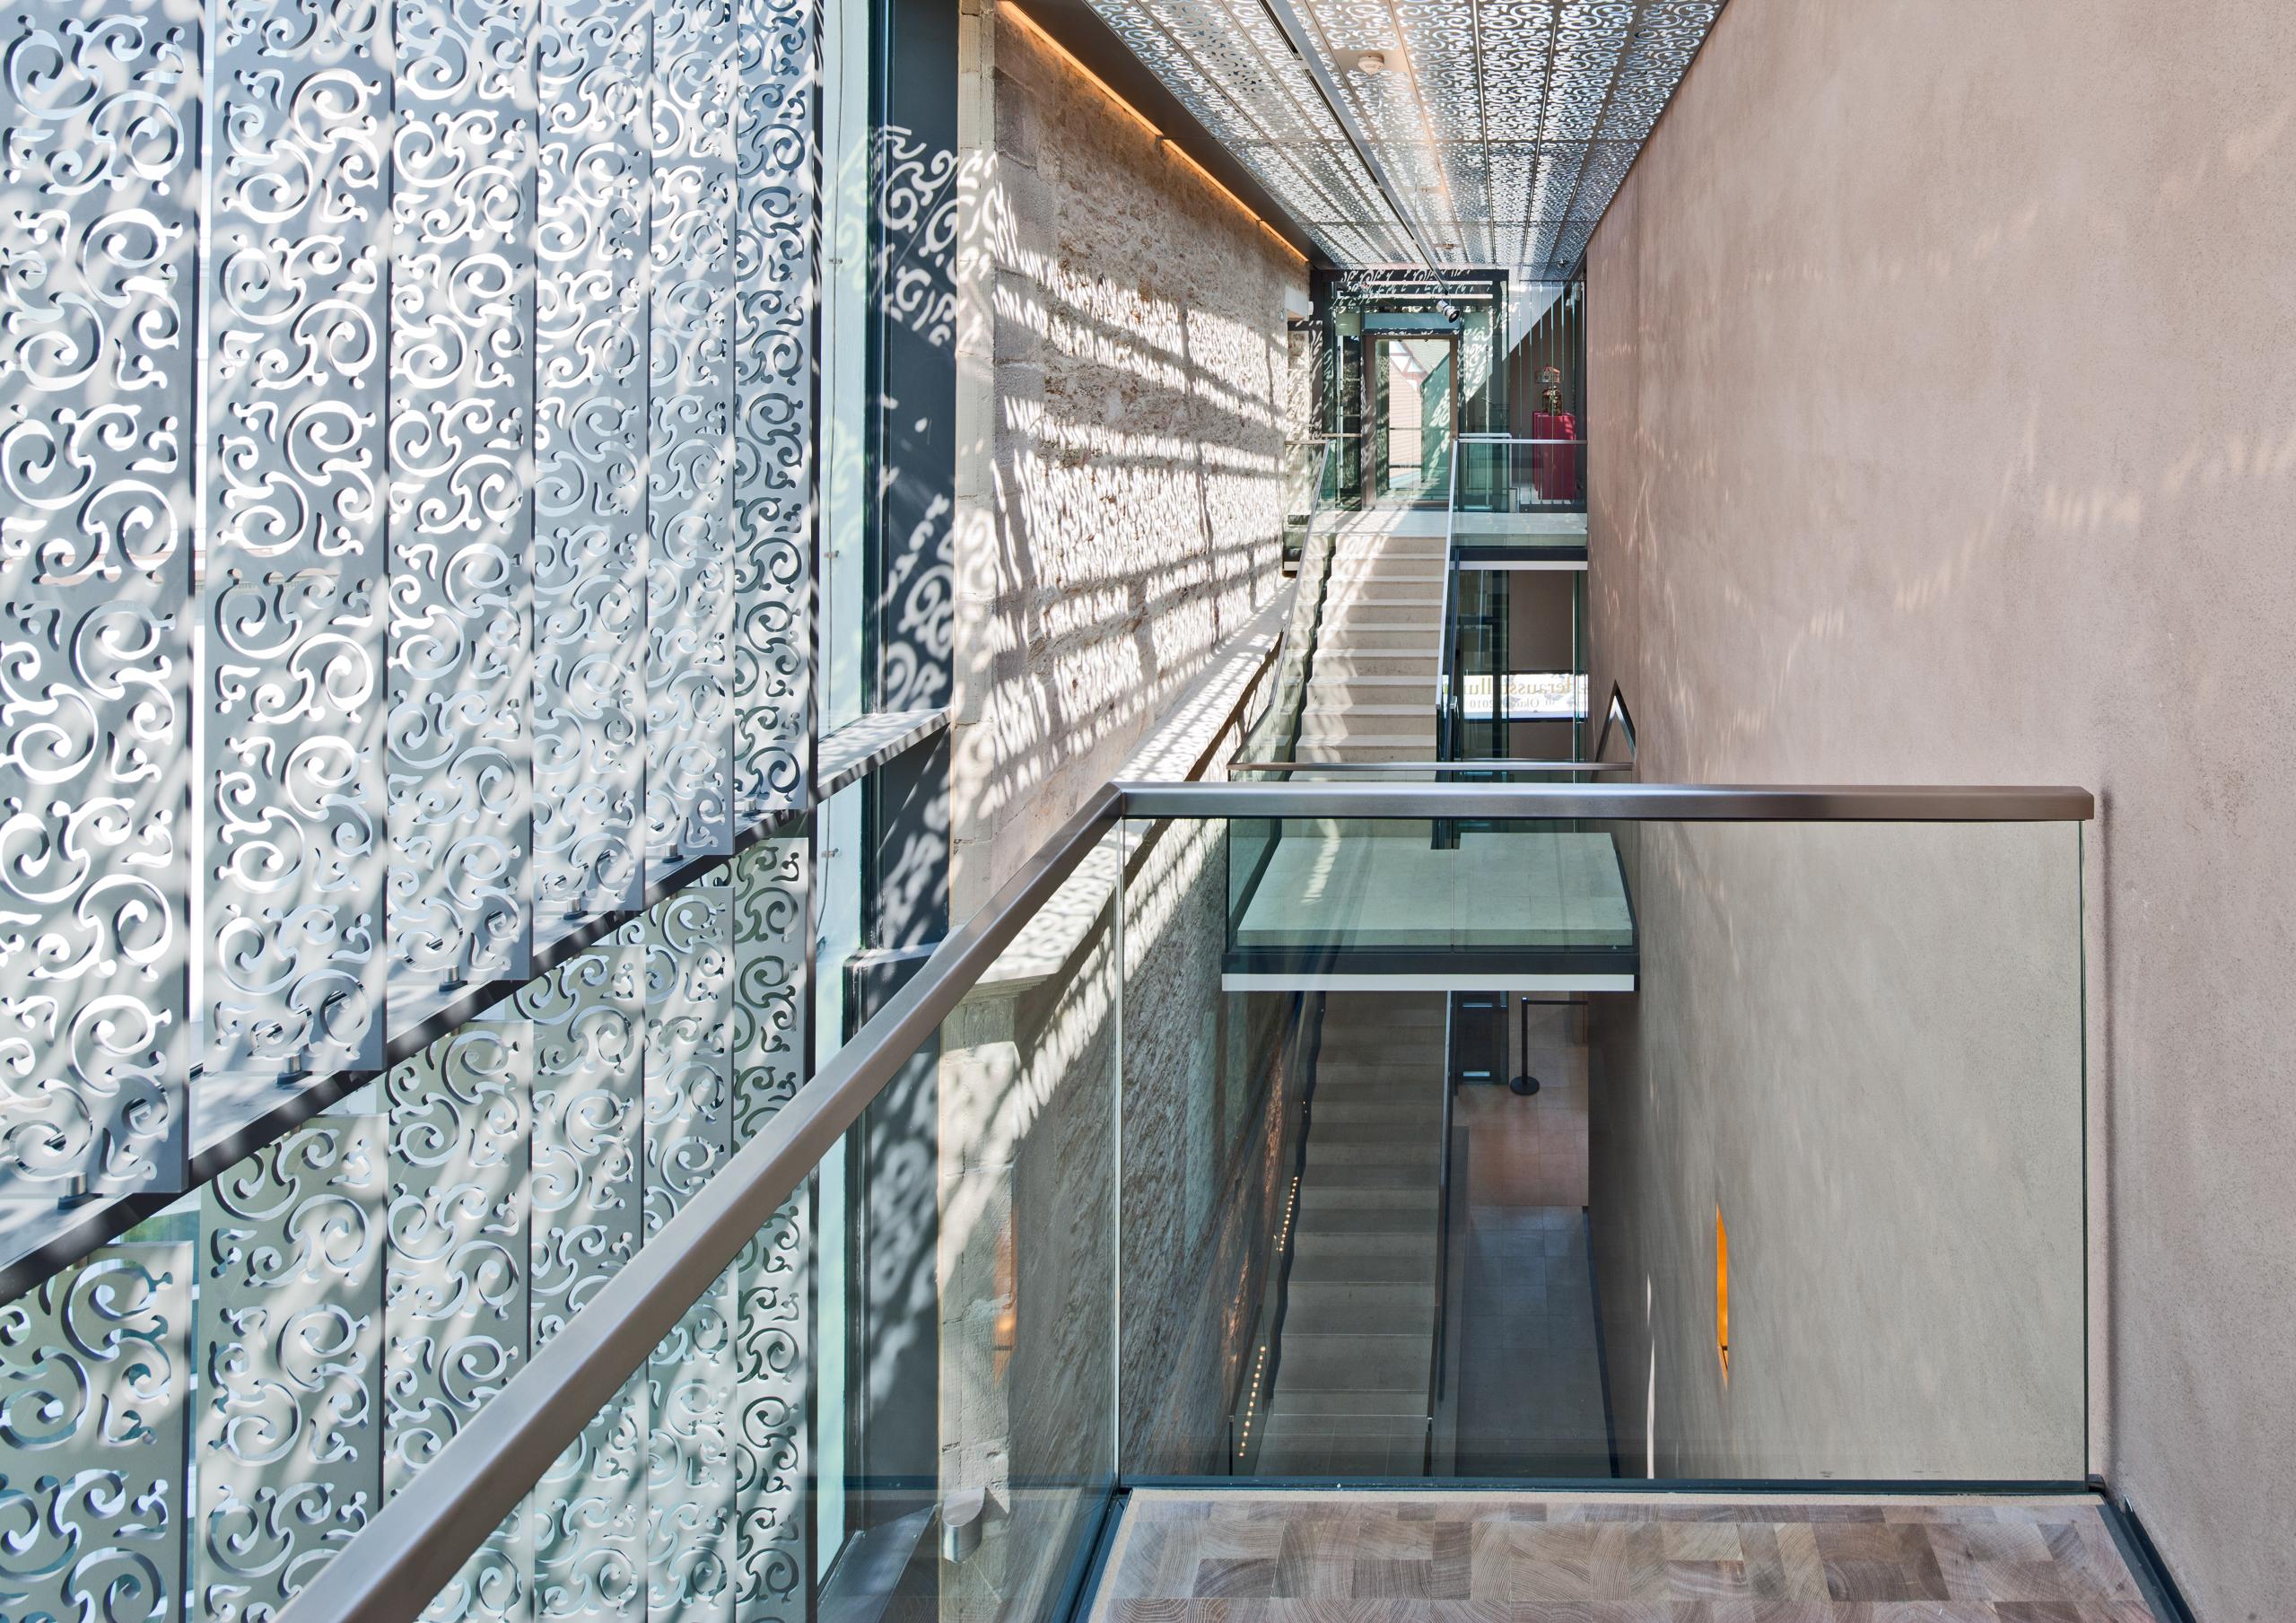 https://www.architektur-fassade.de/wp-content/uploads/2021/02/08509_KnaufMuseum07.jpg